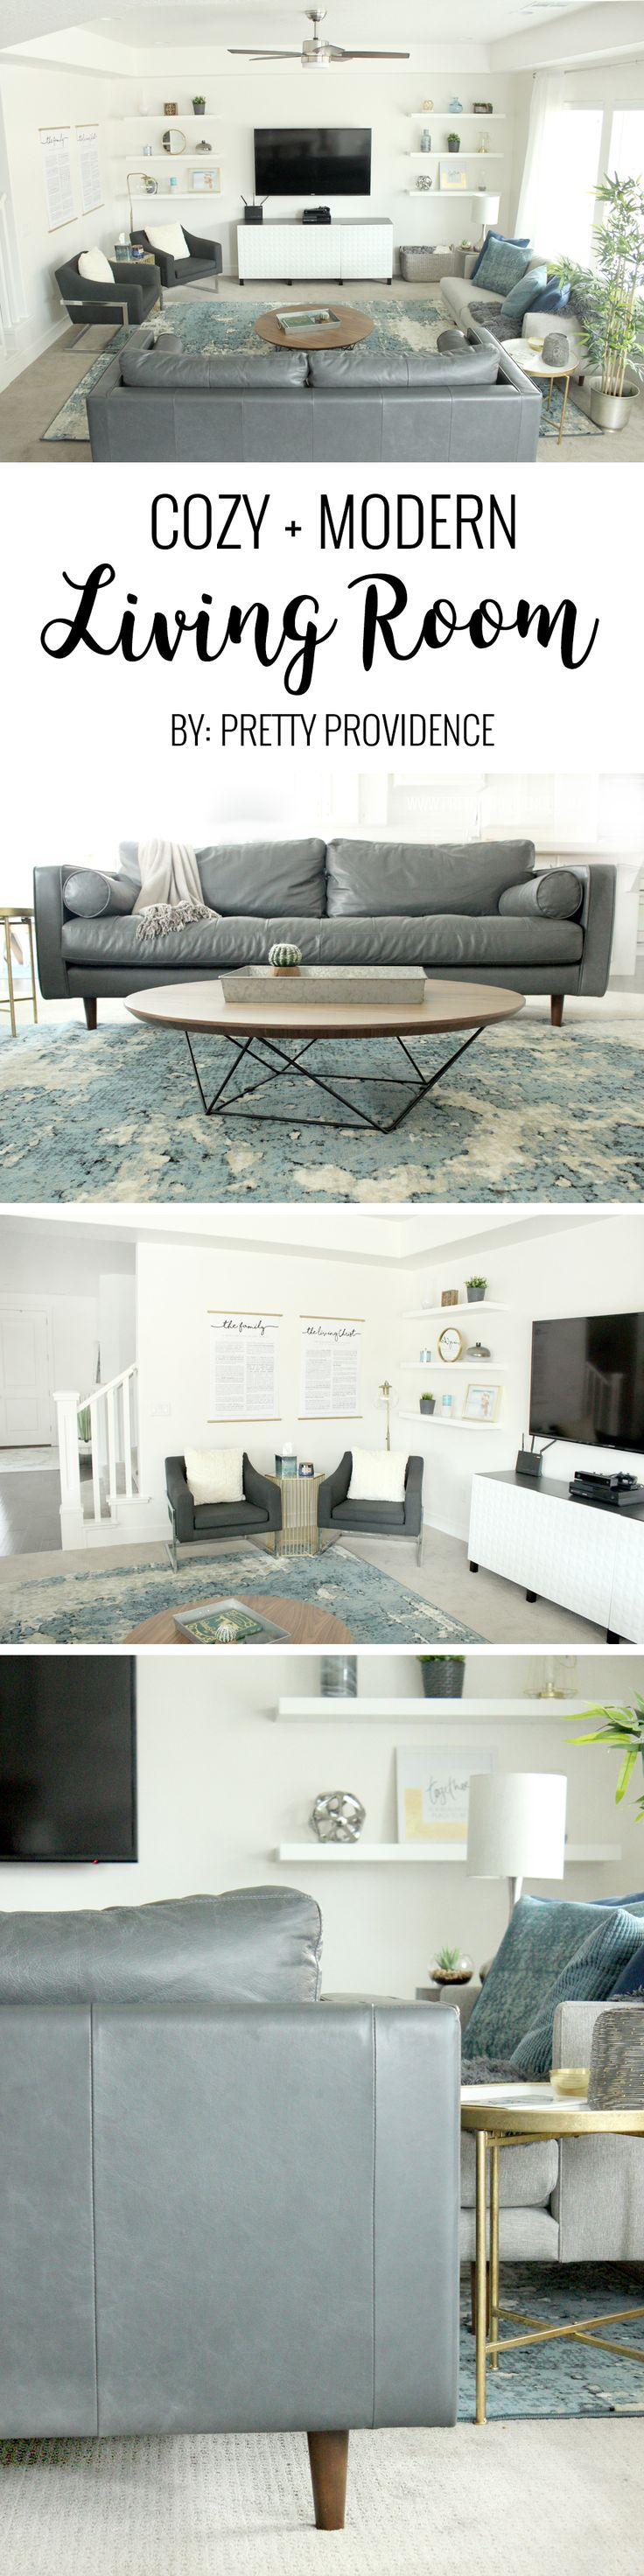 117 best Living Room Ideas images on Pinterest | Decorating ideas ...